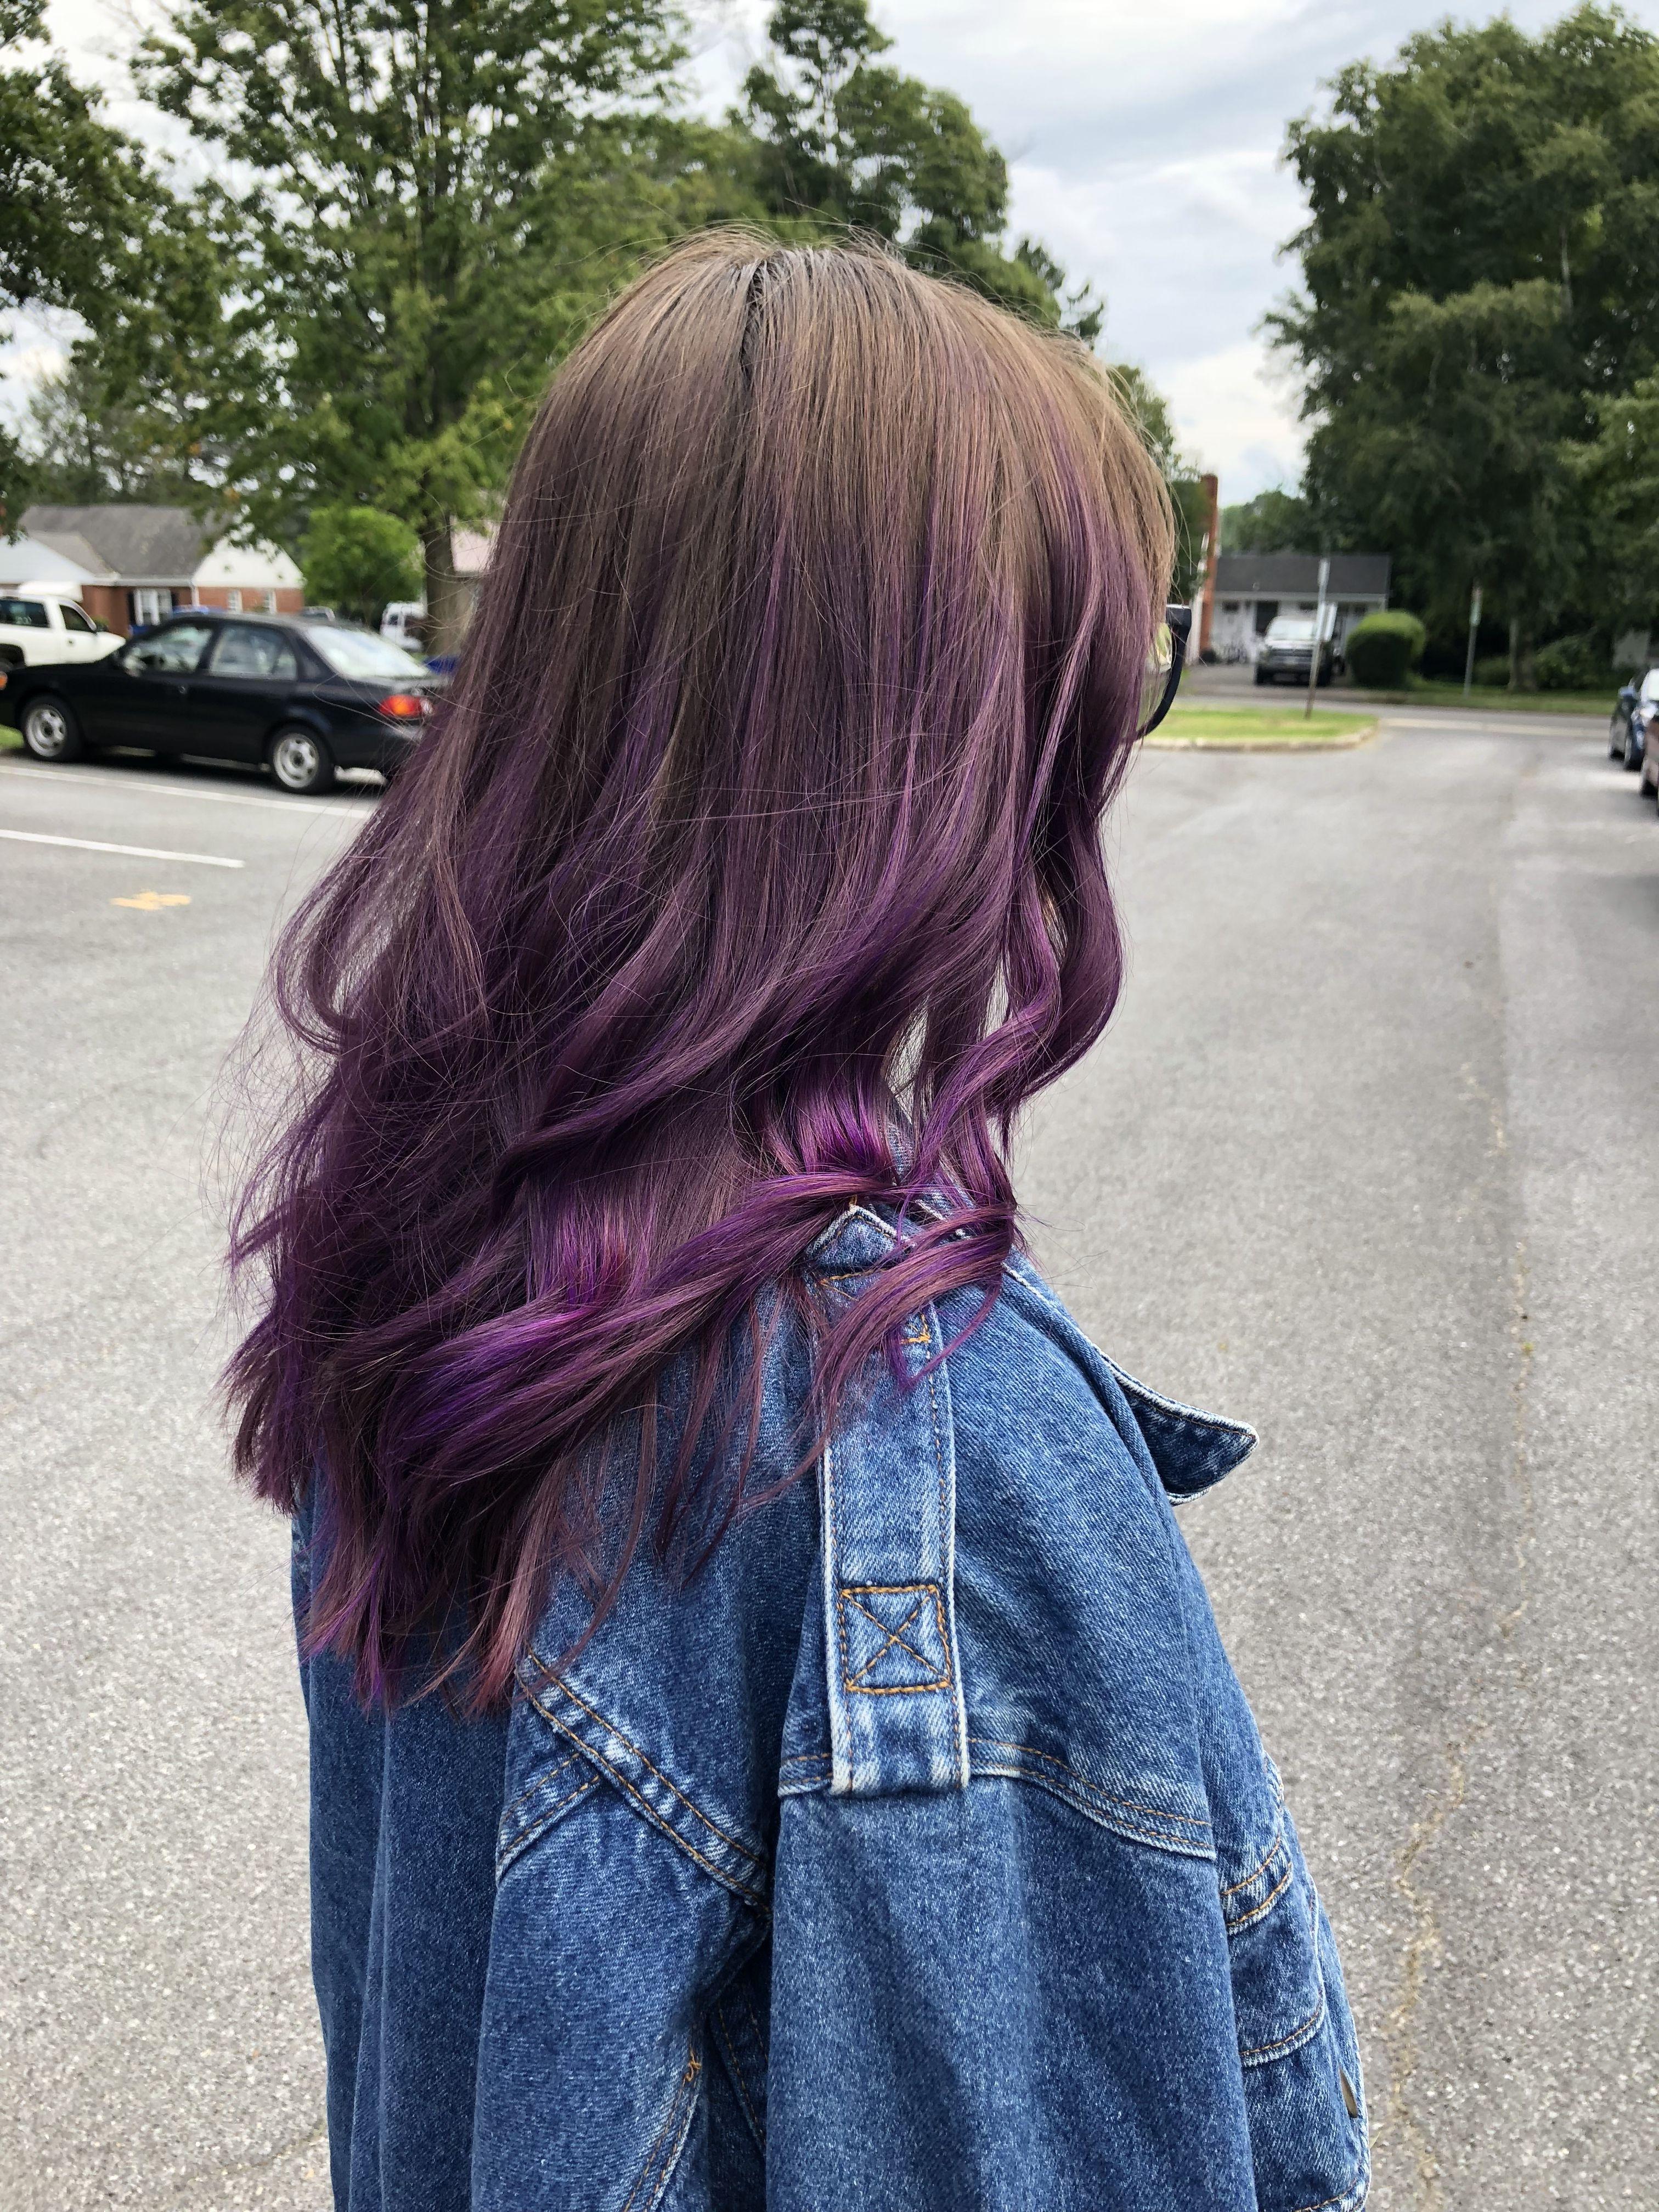 Arctic Fox Purple Rain Hair Brown Medium Brown Balayage Brown Hair To Purple Purple Brown Hair Purple Balayage Brown Hair With Highlights